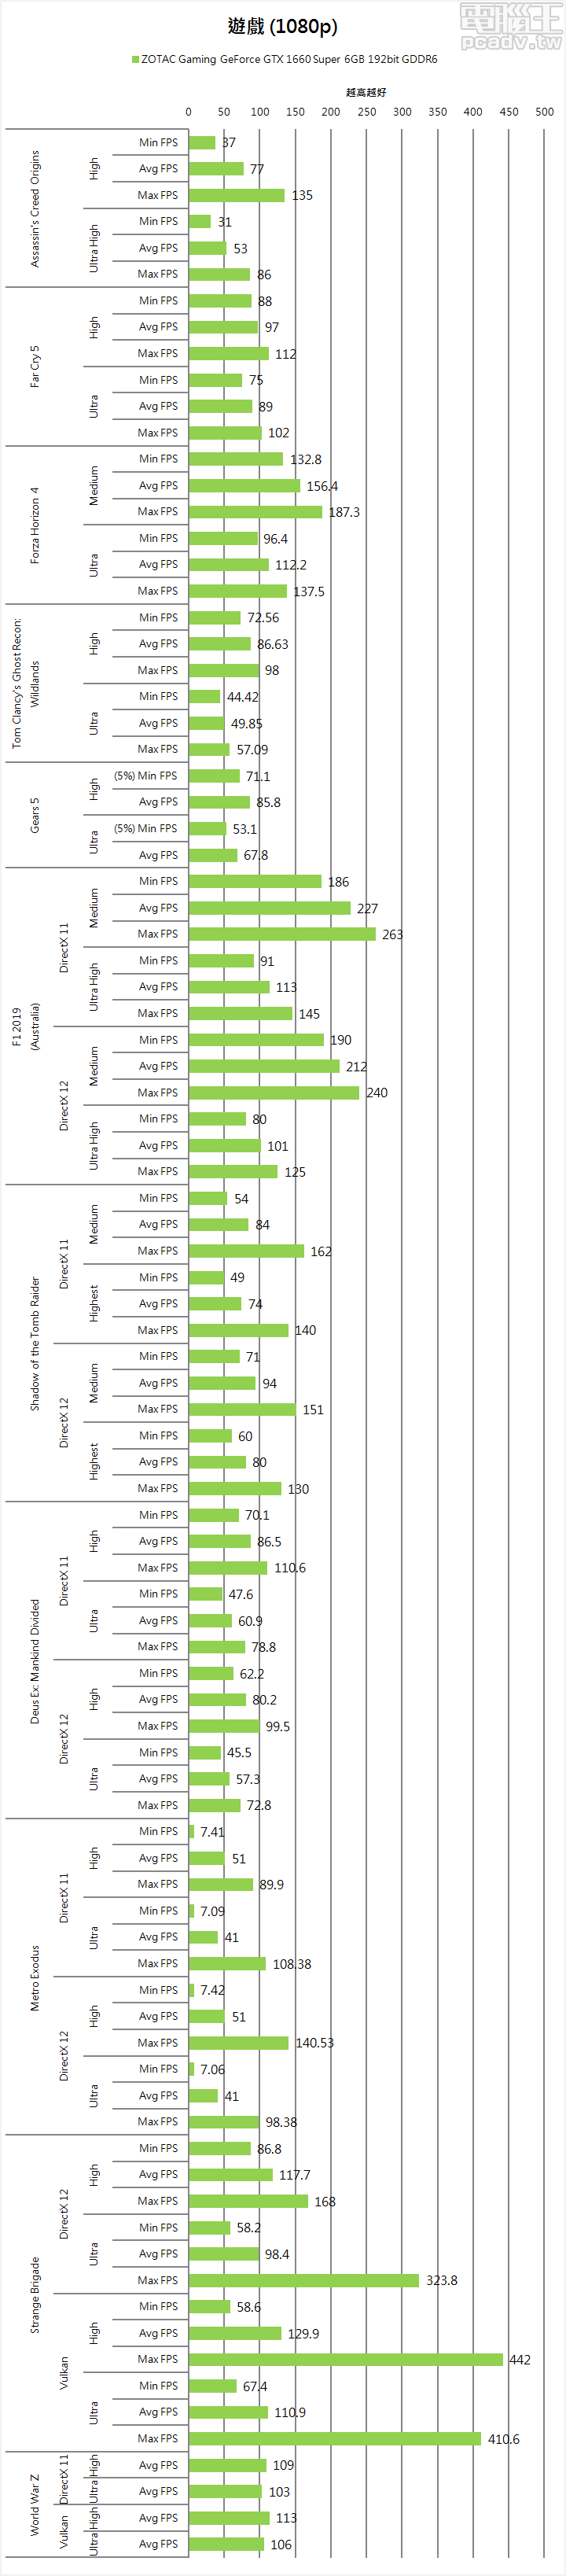 ▲ Gaming GeForce GTX 1660 Super 6GB 於 1080p 解析度,多款遊戲畫質�定調整至超高�級,仍然有著 60FPS 以上的表現。畫面表現較高的大作如 Assassin's Creed Origins「刺客教條:起源」、Tom Clancy's Ghost Recon: Wildlands「火線獵殺:野境」、Deus Ex: Mankind Divided「�客入侵:人類岐裂」,僅需將畫質下調 1 個�級,也能夠享有 60FPS 以上的畫面速率。